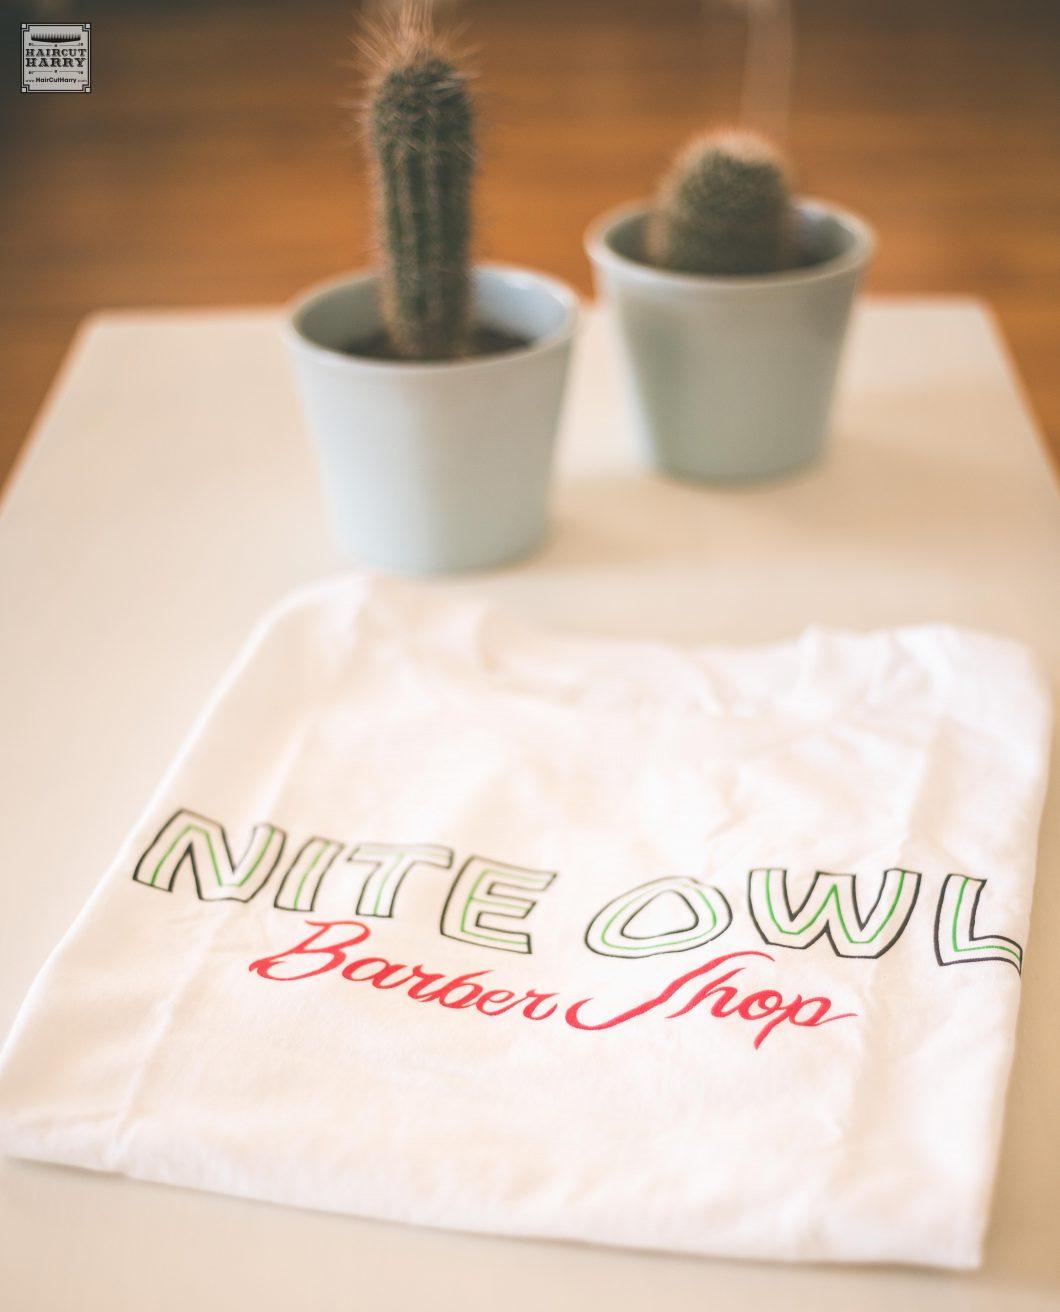 The Nite Owl T-Shirt Prize